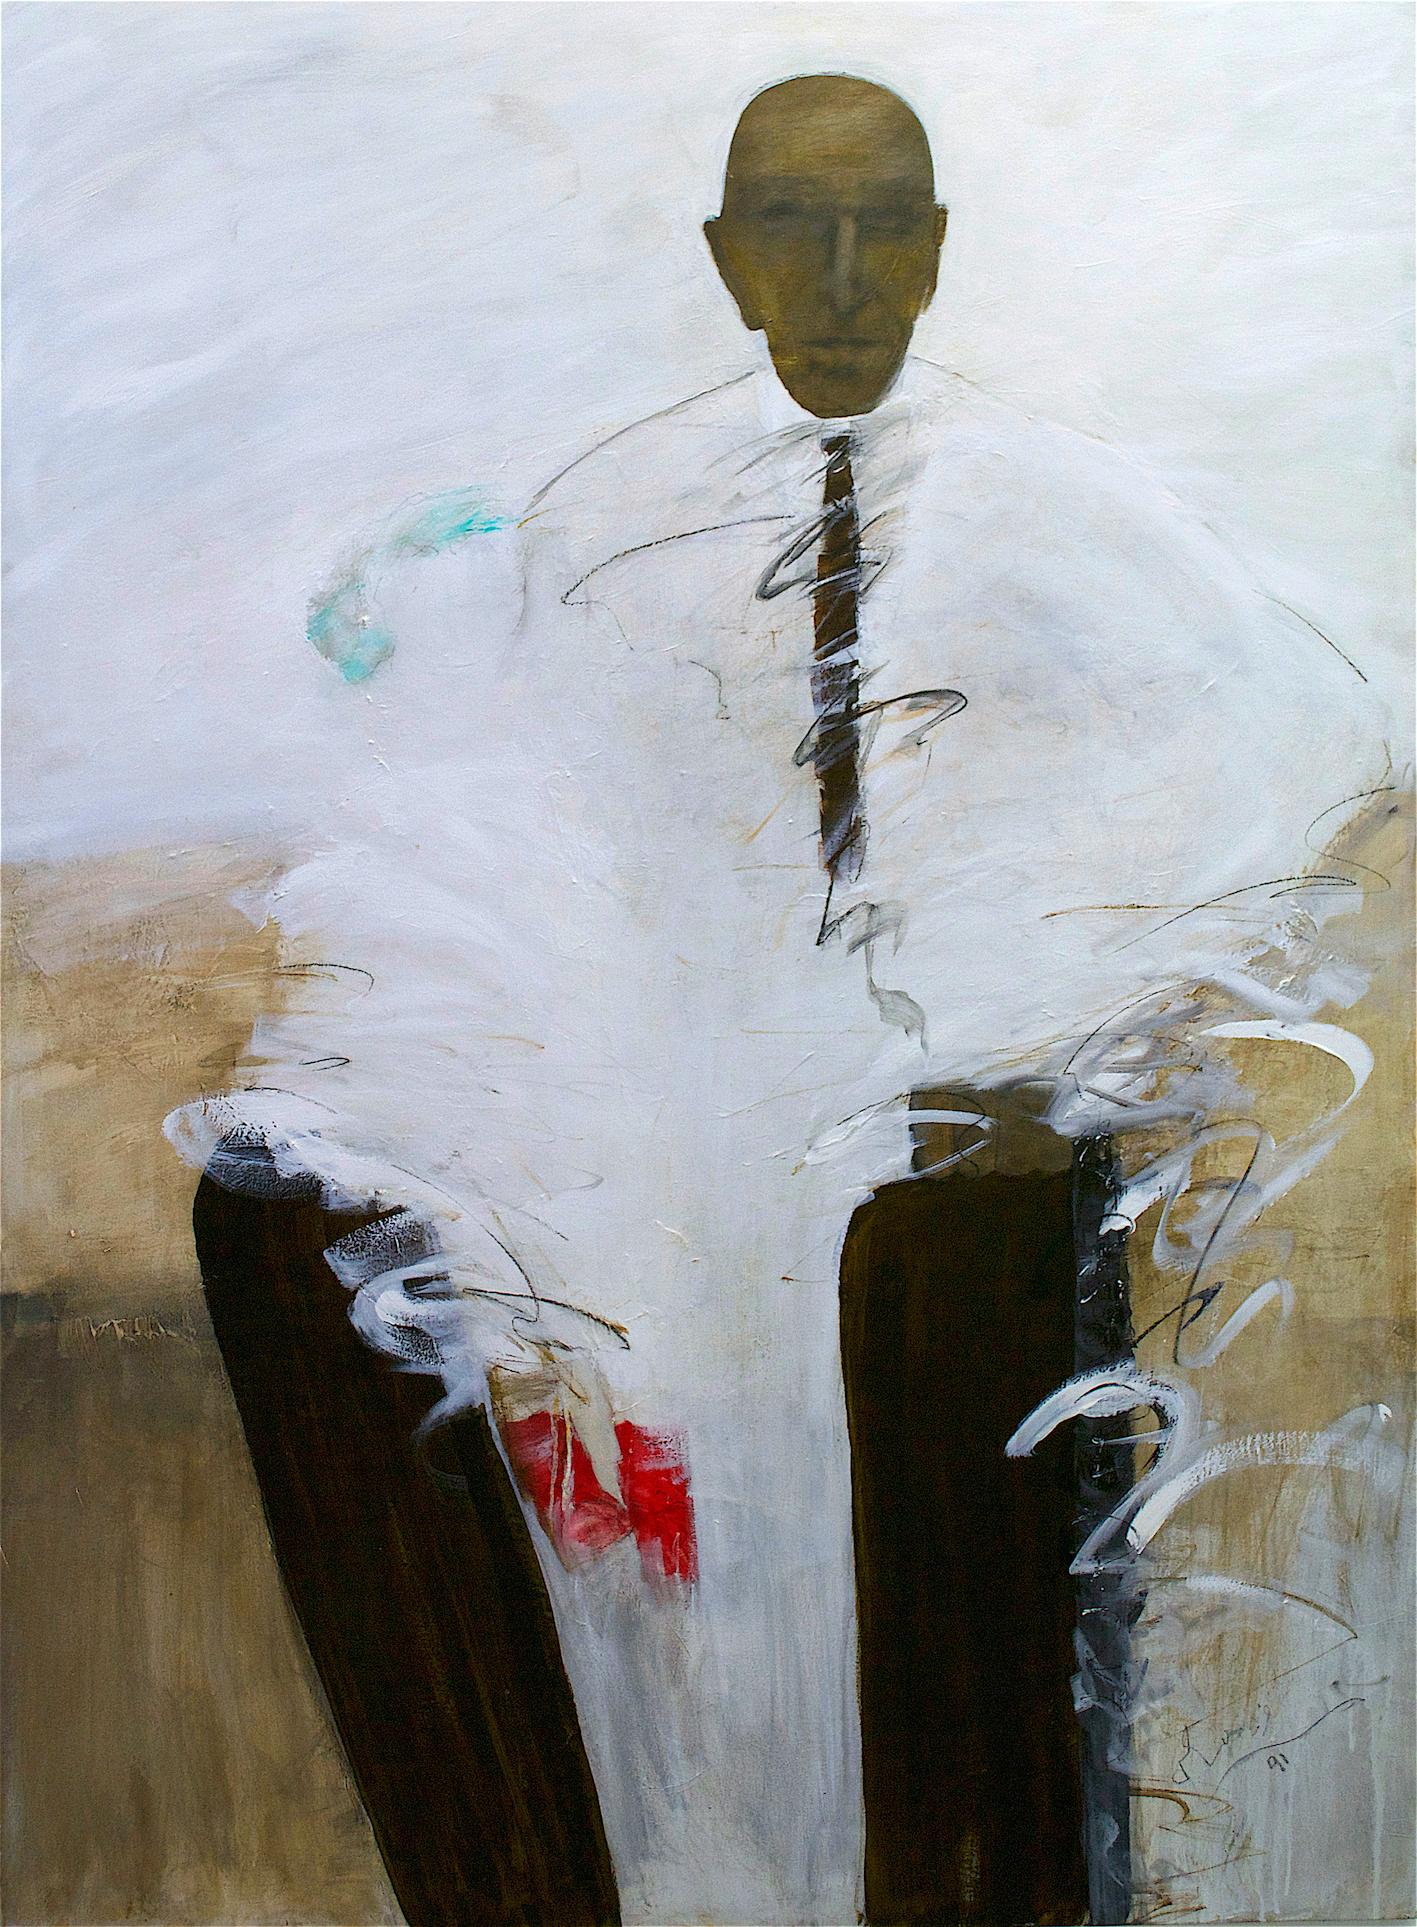 Fondation Behnam Bakhtiar.Farideh Lashai.Mossadegh.Iranian art